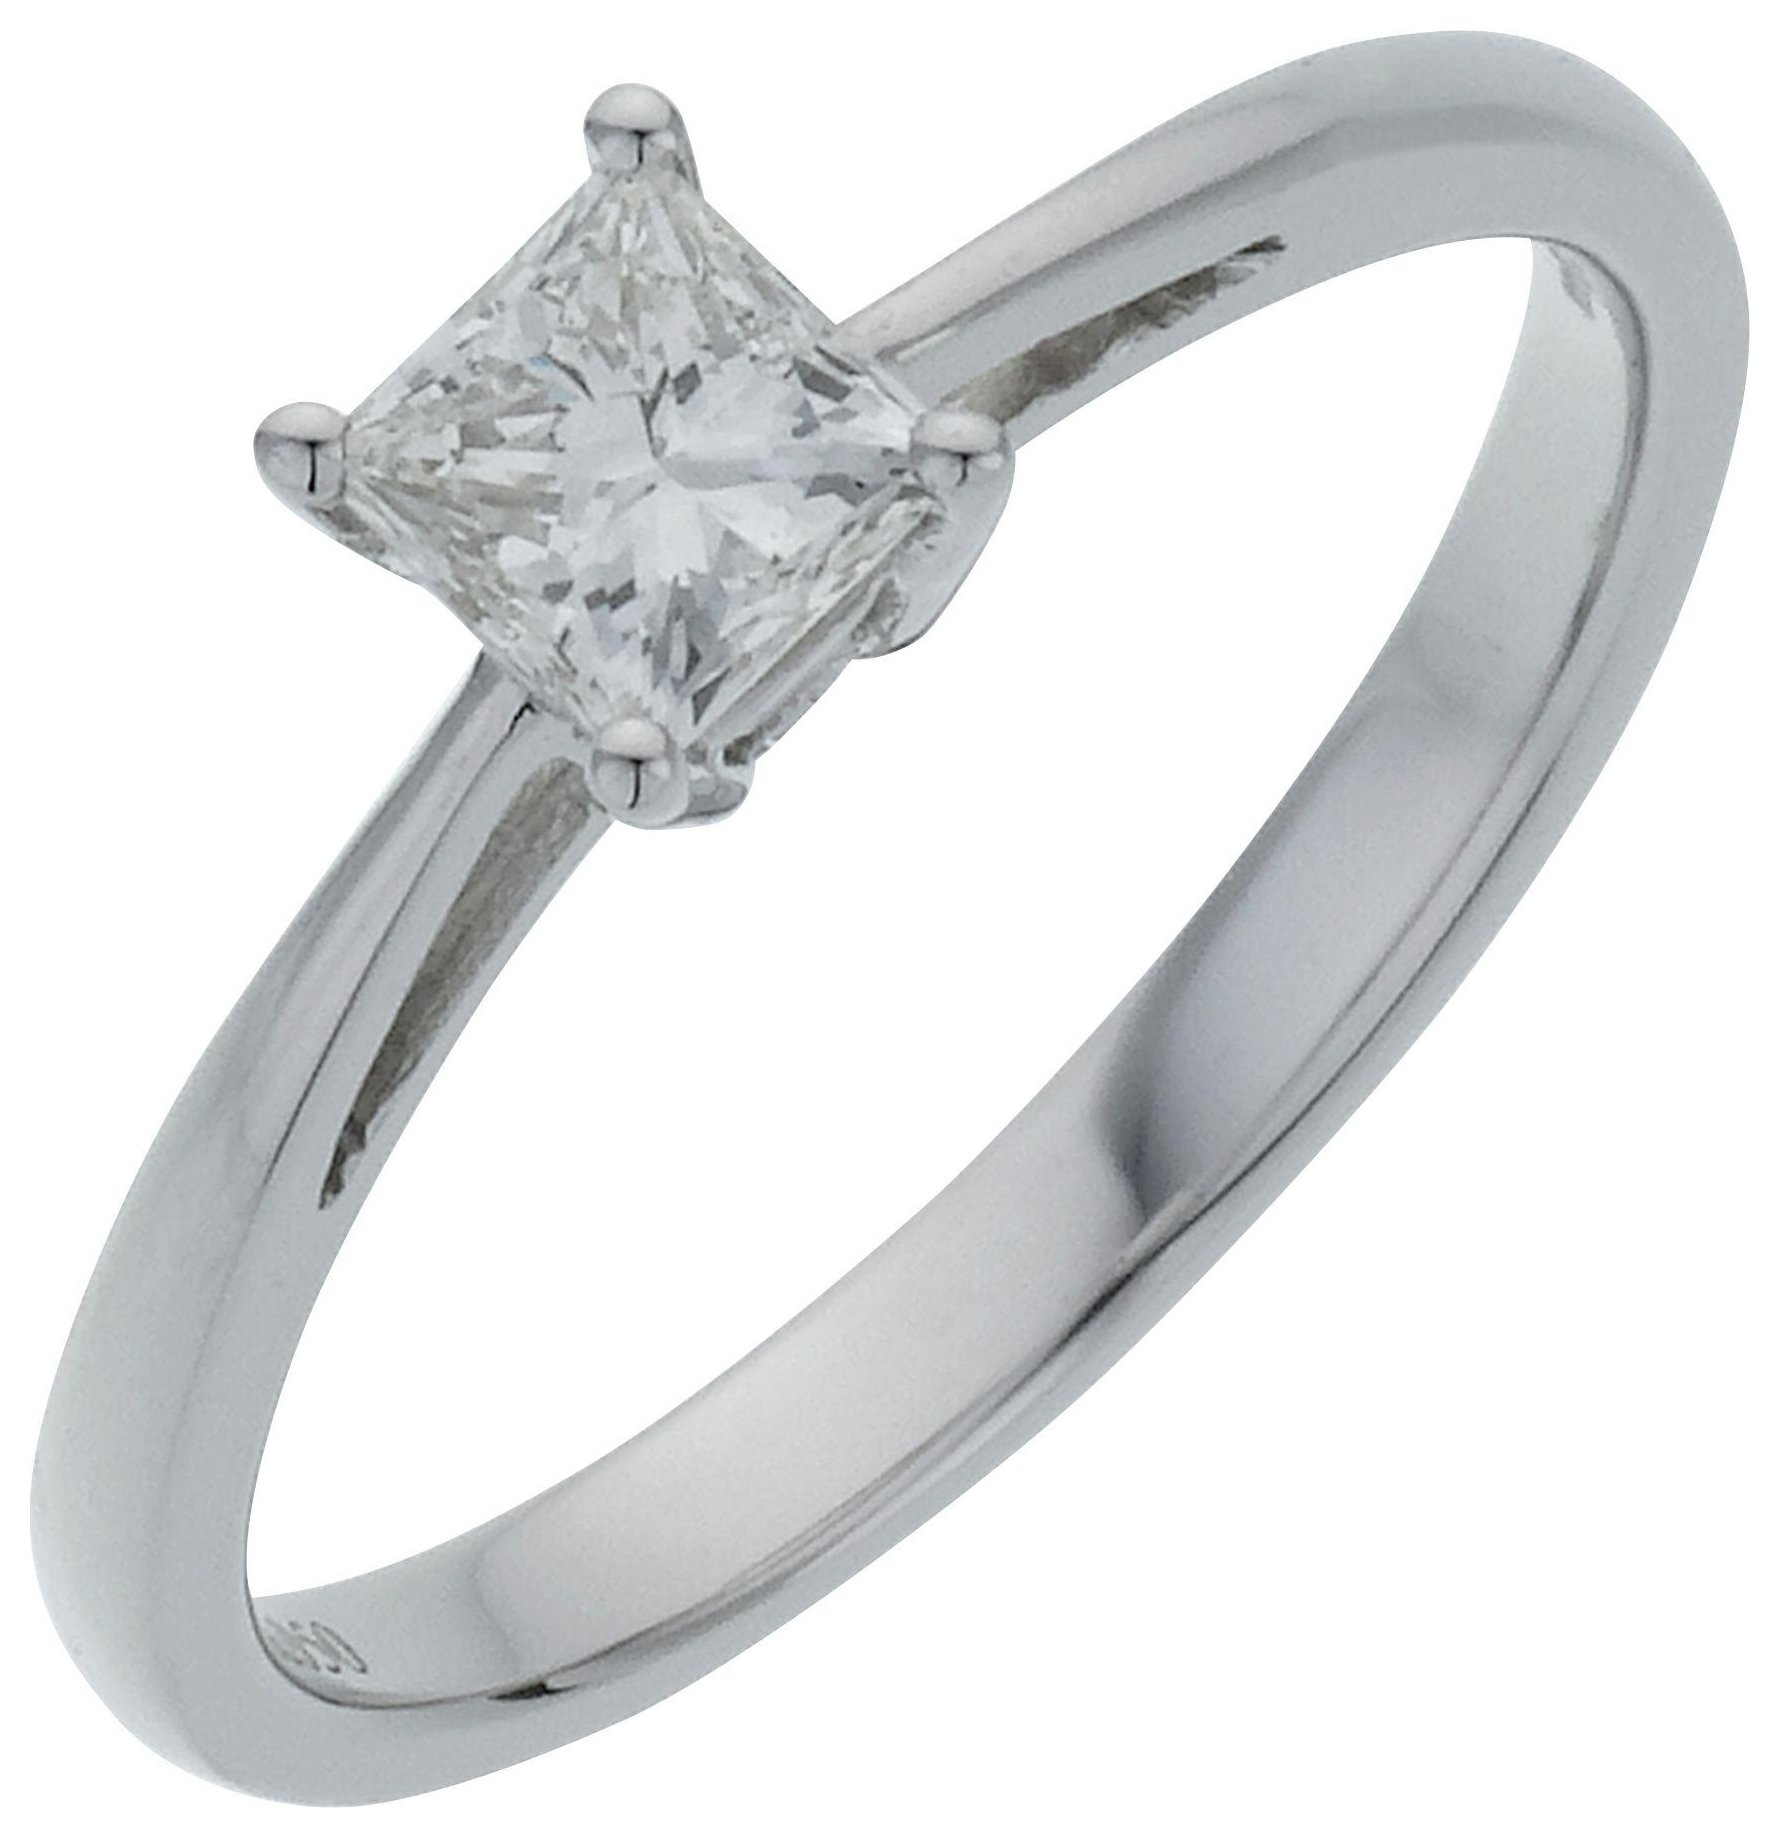 18 Carat White Gold 05 Carat Diamond - Princess Cut Diamond - Ring - U